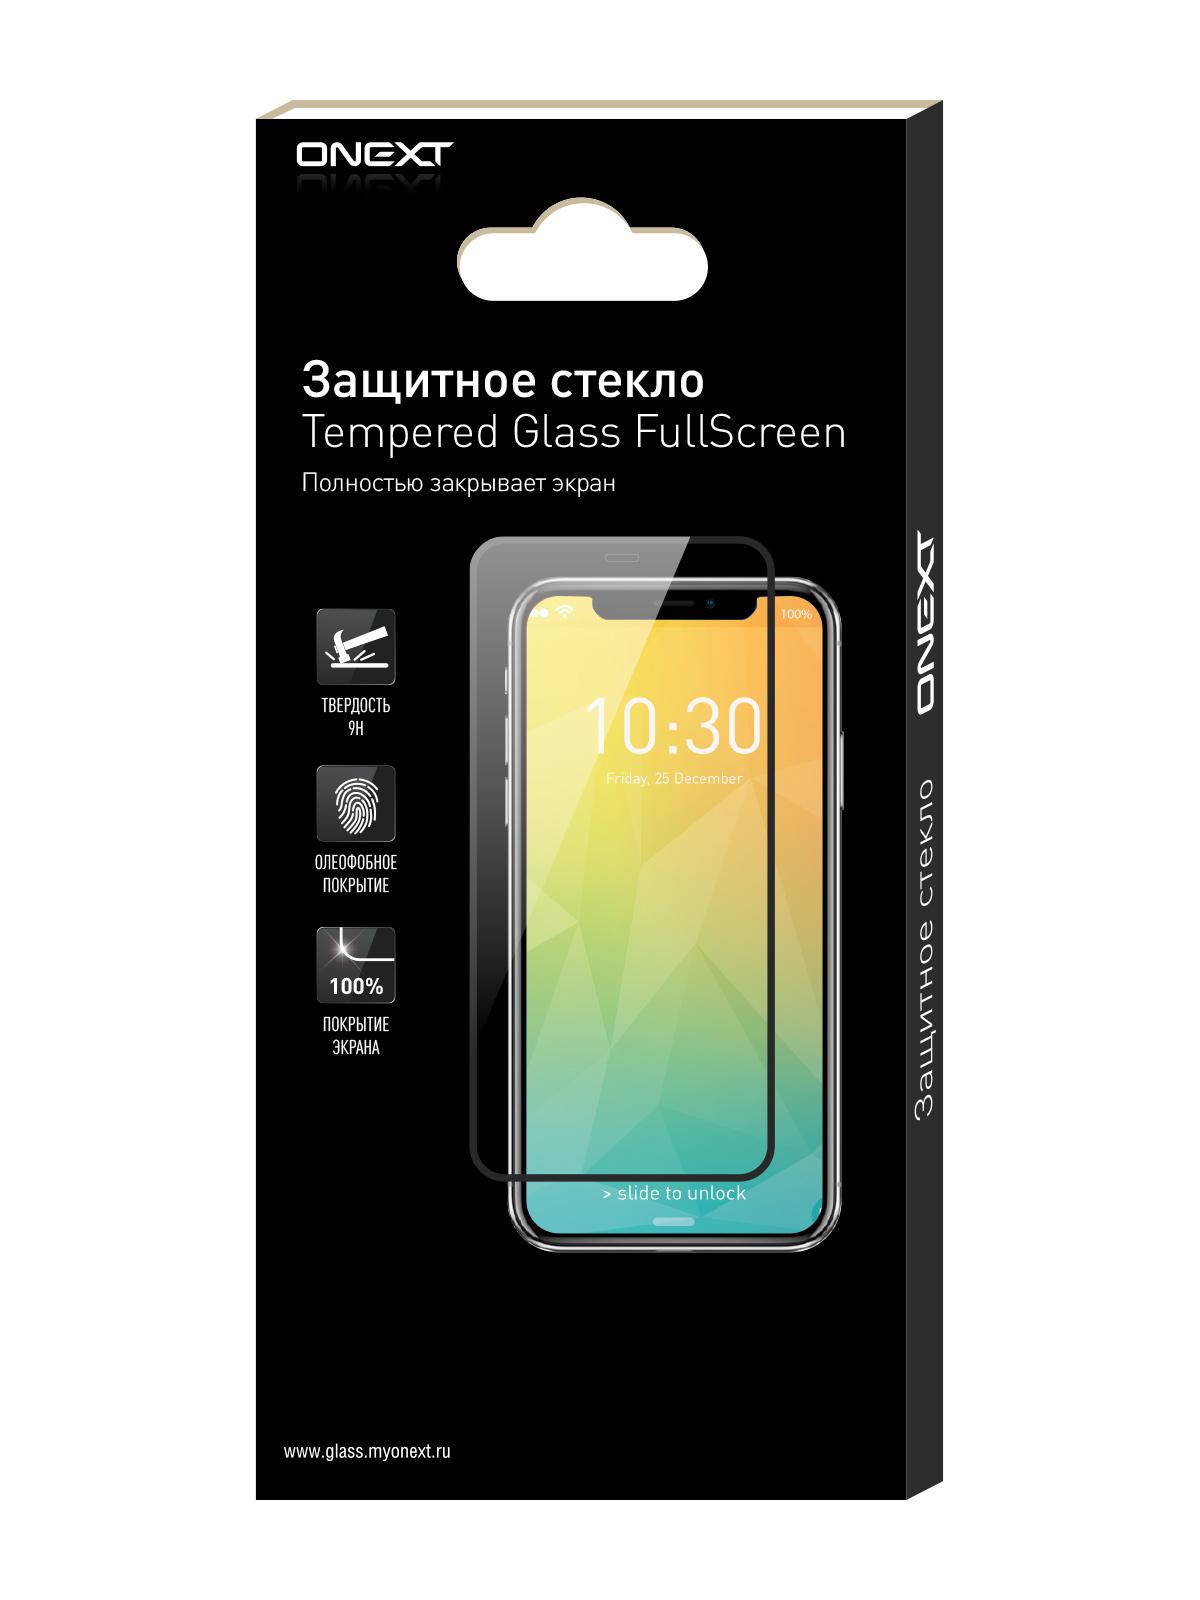 Защитное стекло ONEXT для Apple iPhone 7 Plus Black